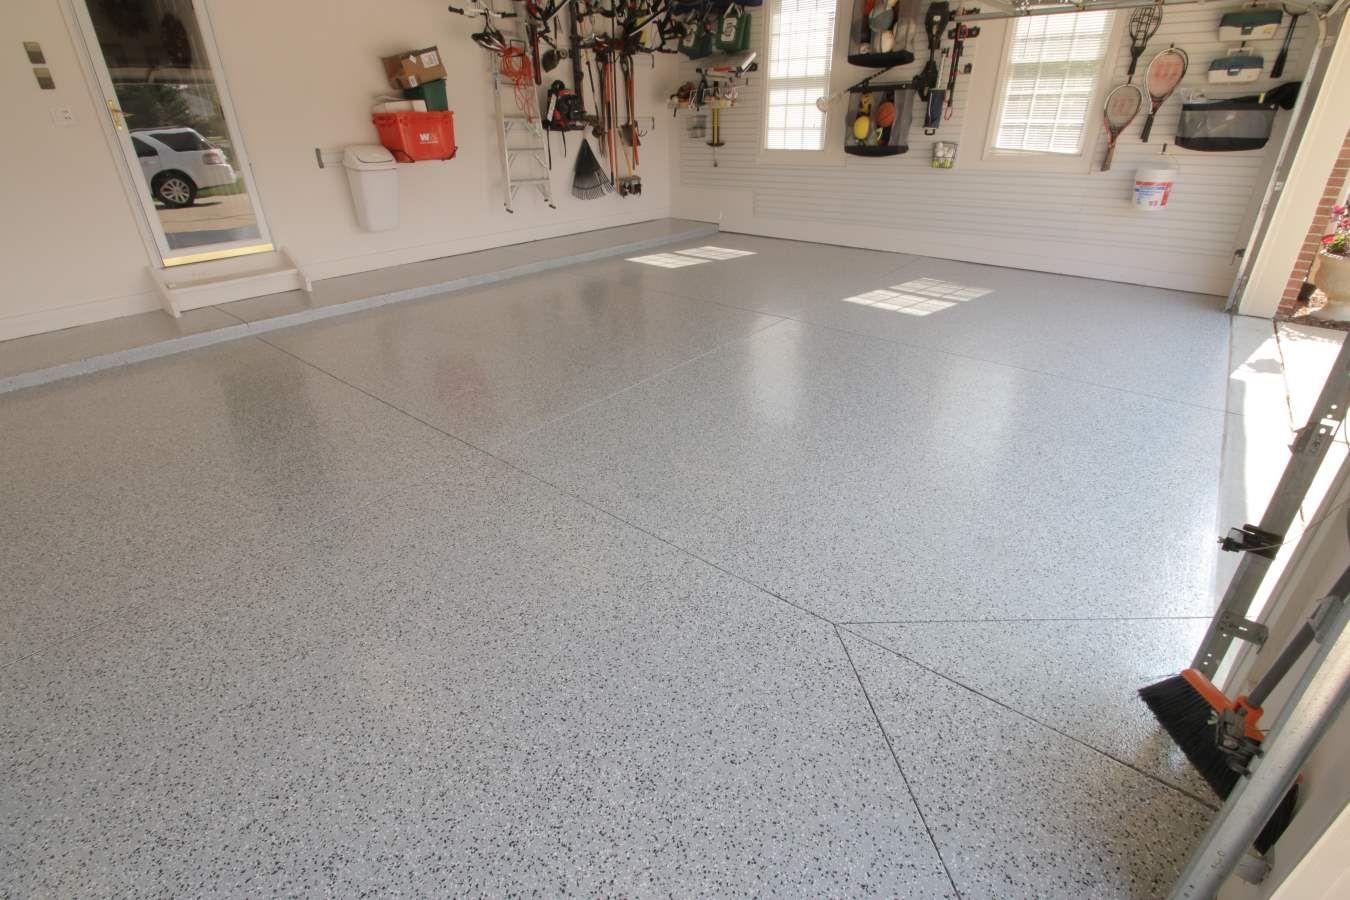 Laminate Flooring in Garage